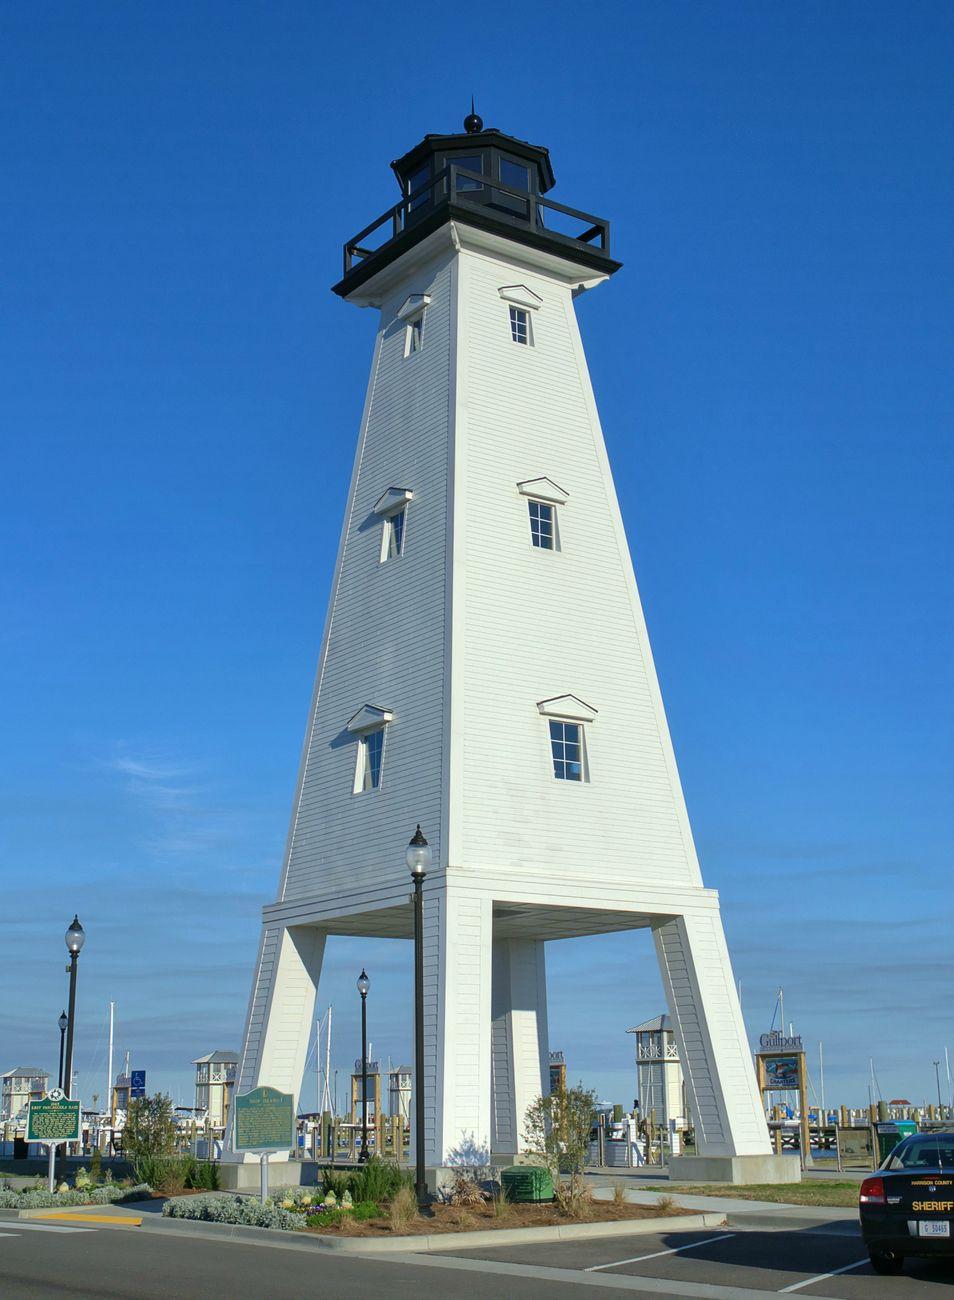 I owe my life to the lighthouse